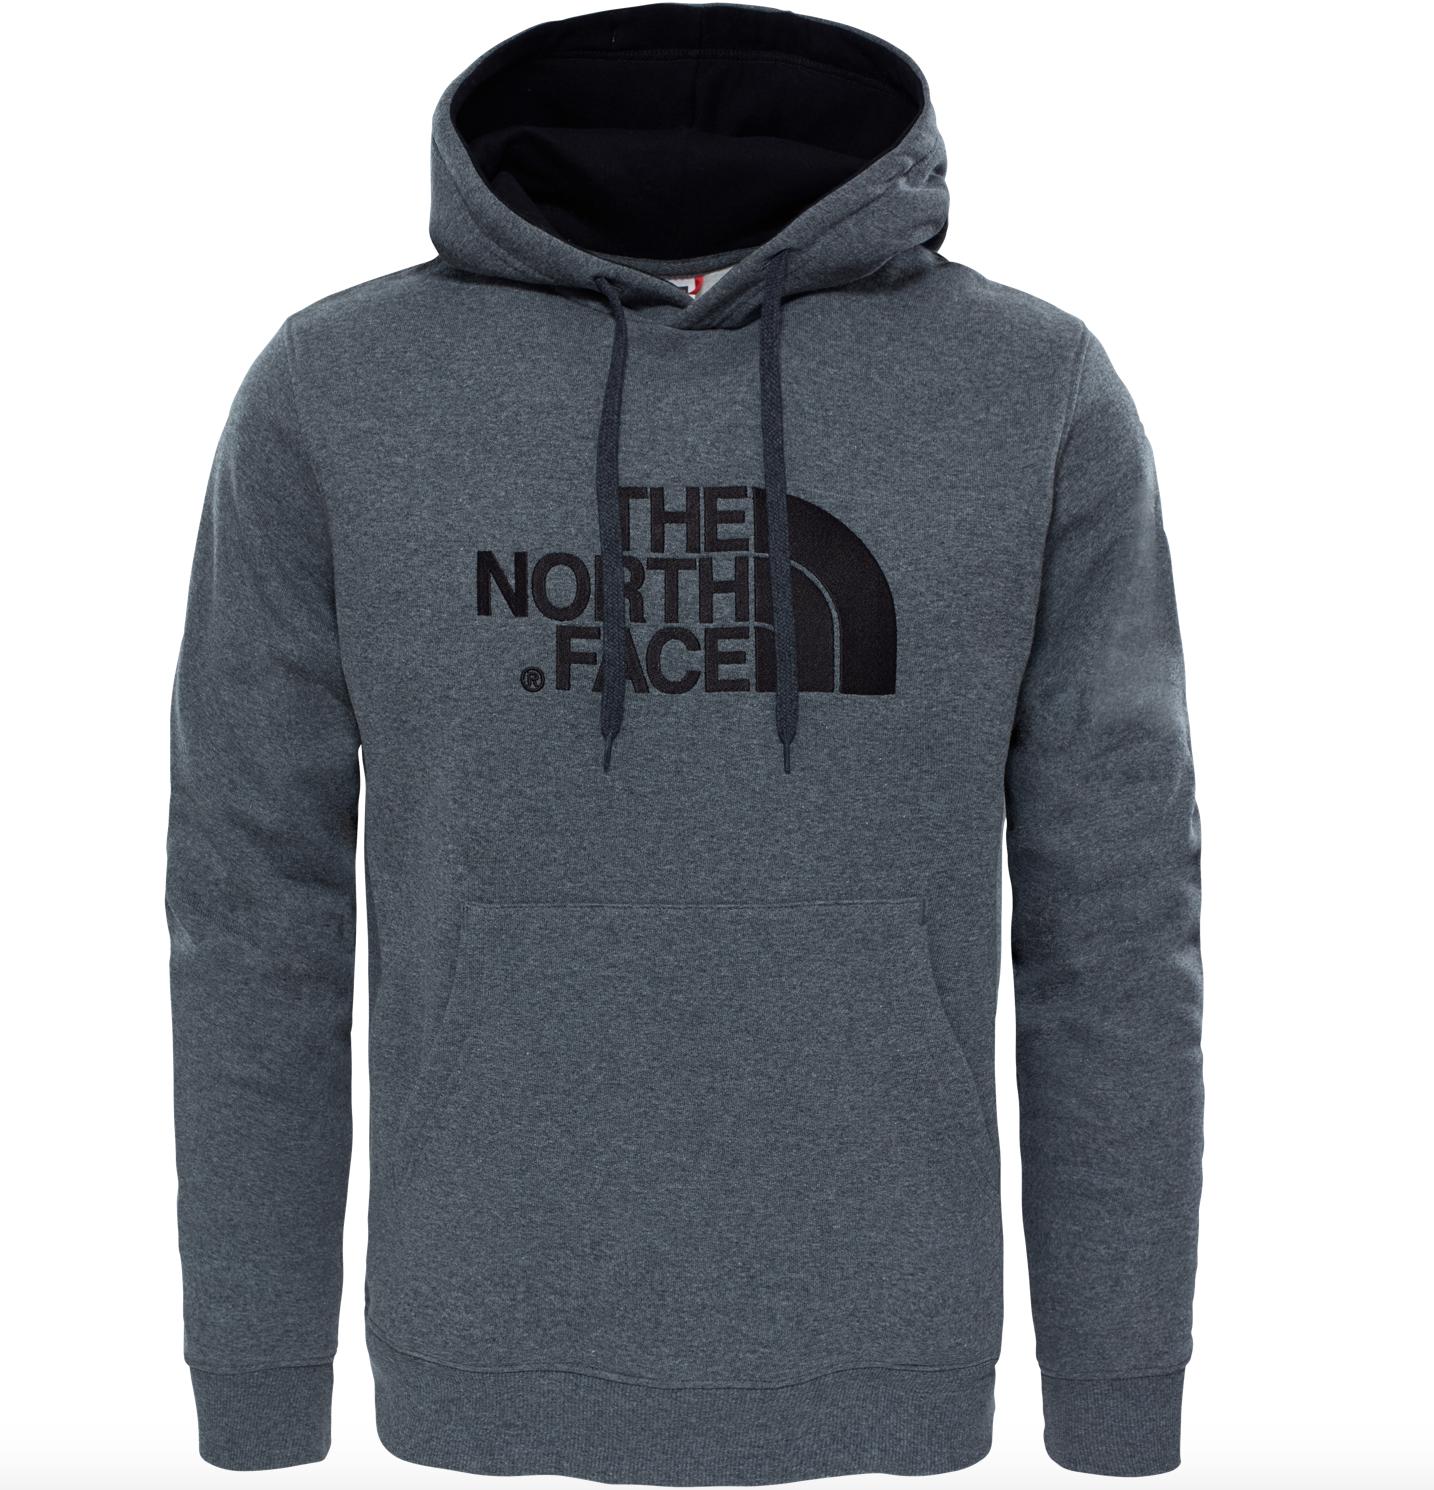 Bilde av The North Face  M DREW PEAK PLV HD Grå